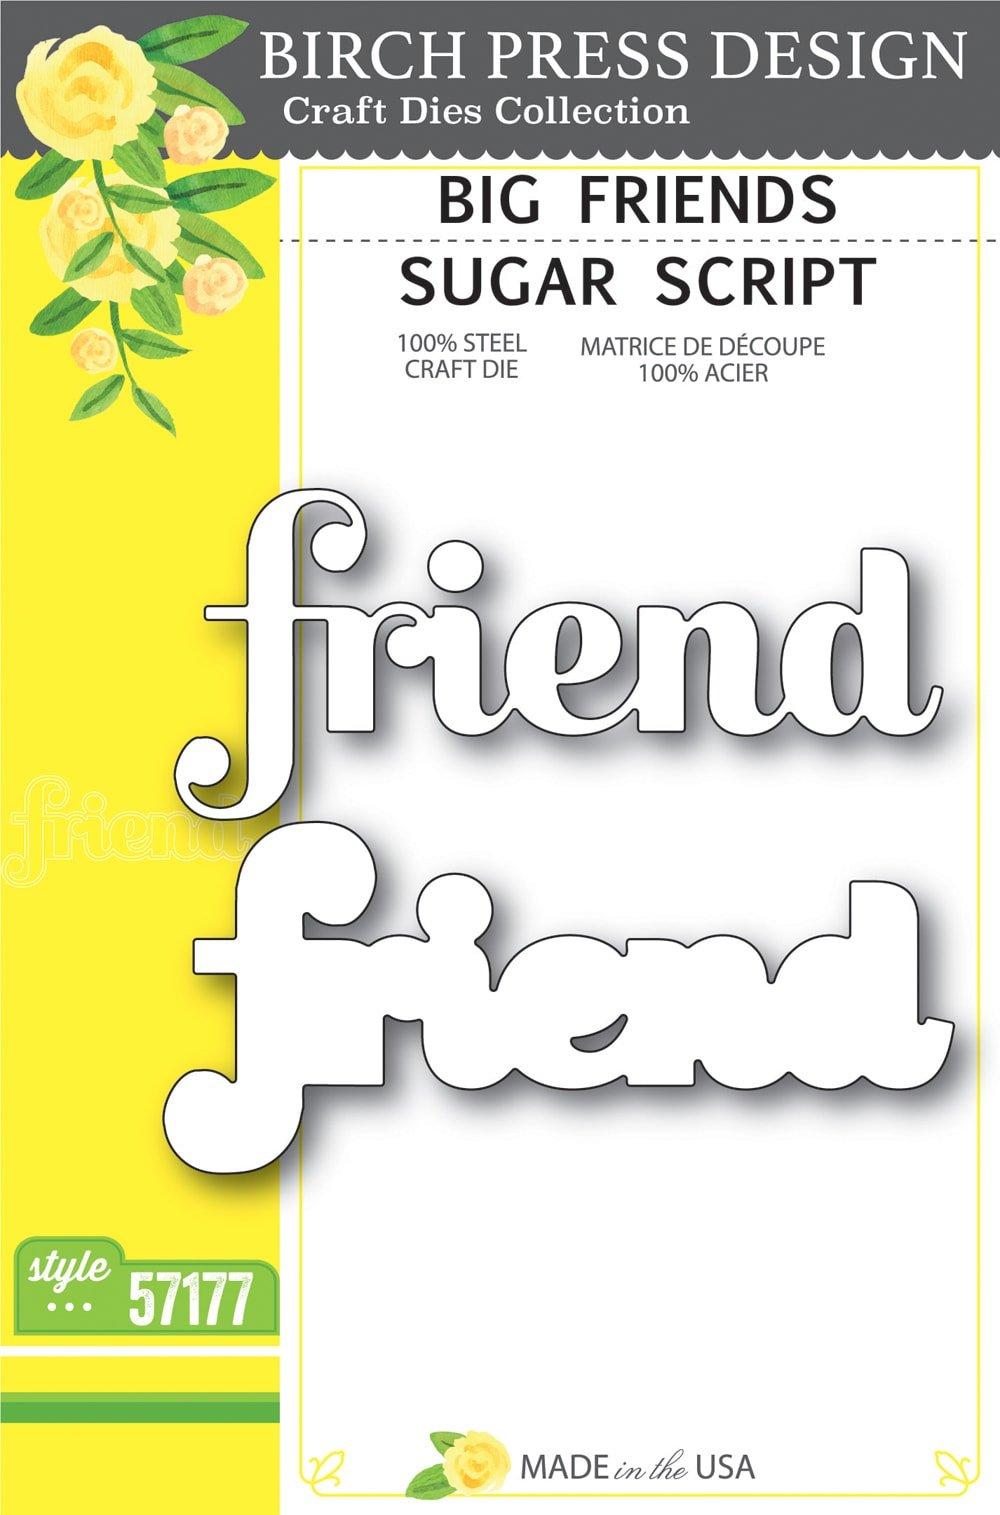 Birch Press Design - Big Friend Sugar Script Die